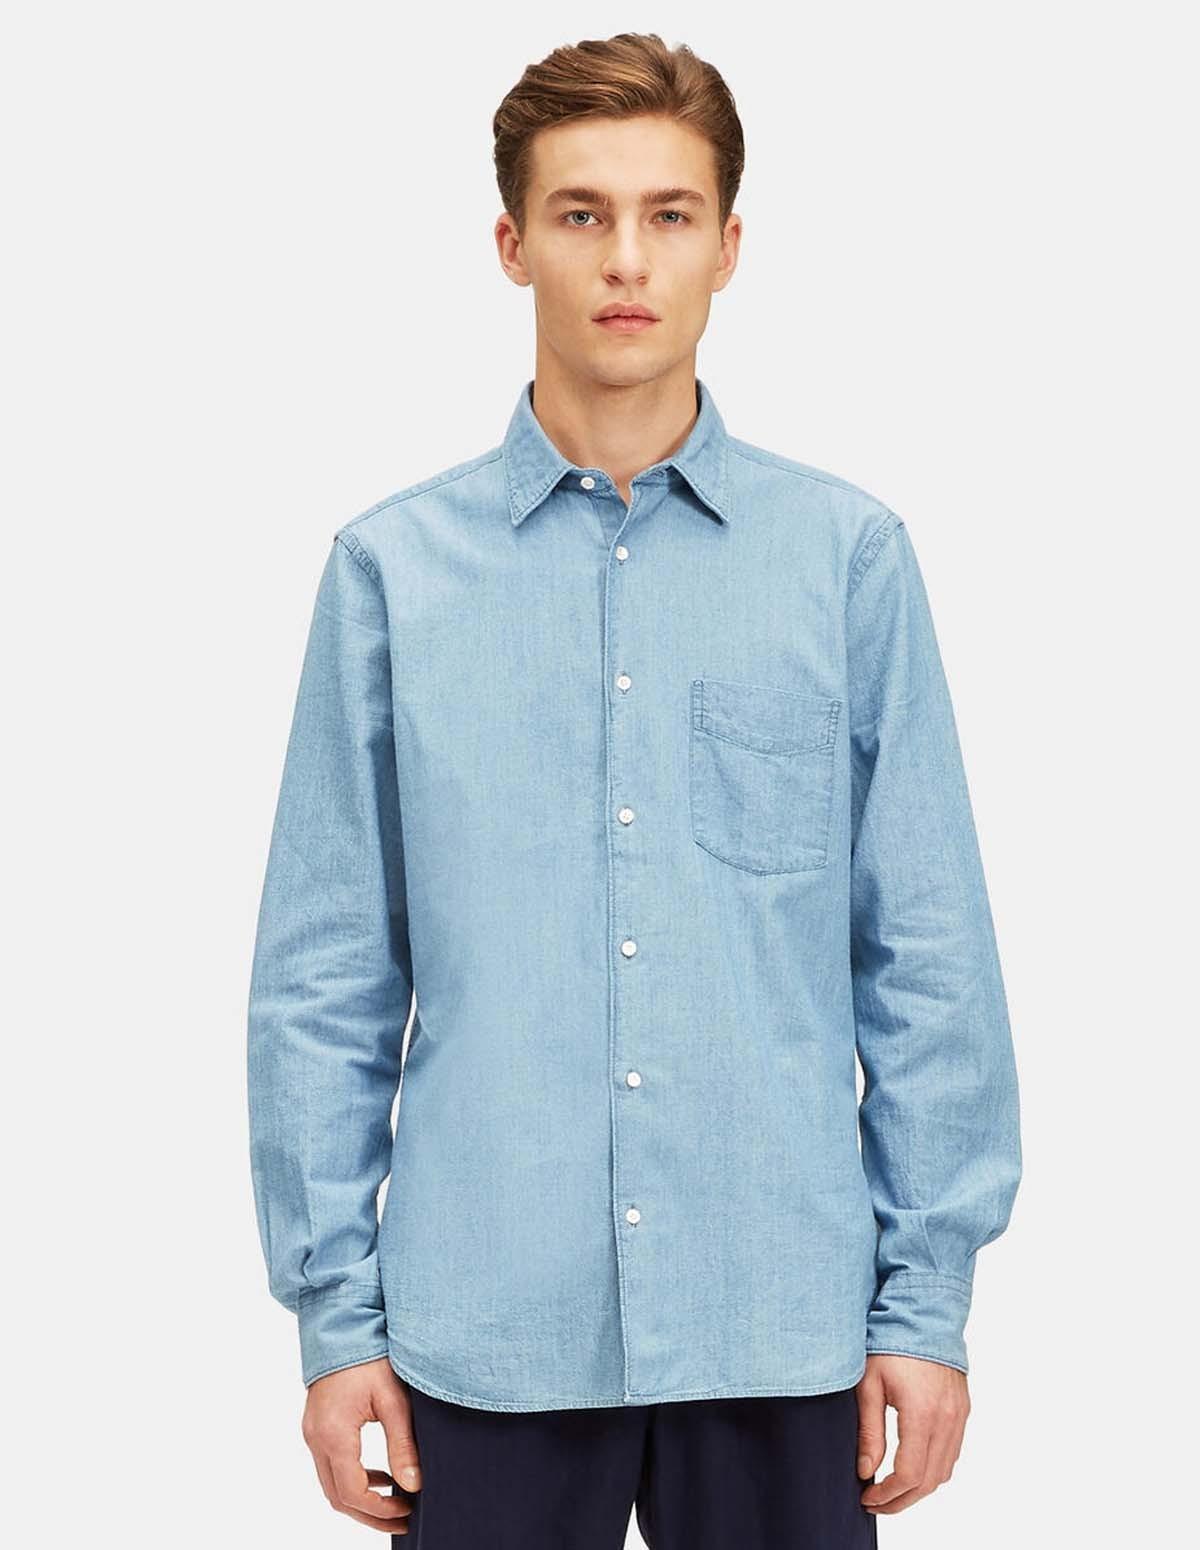 Aspesi Mod Sedici Shirt